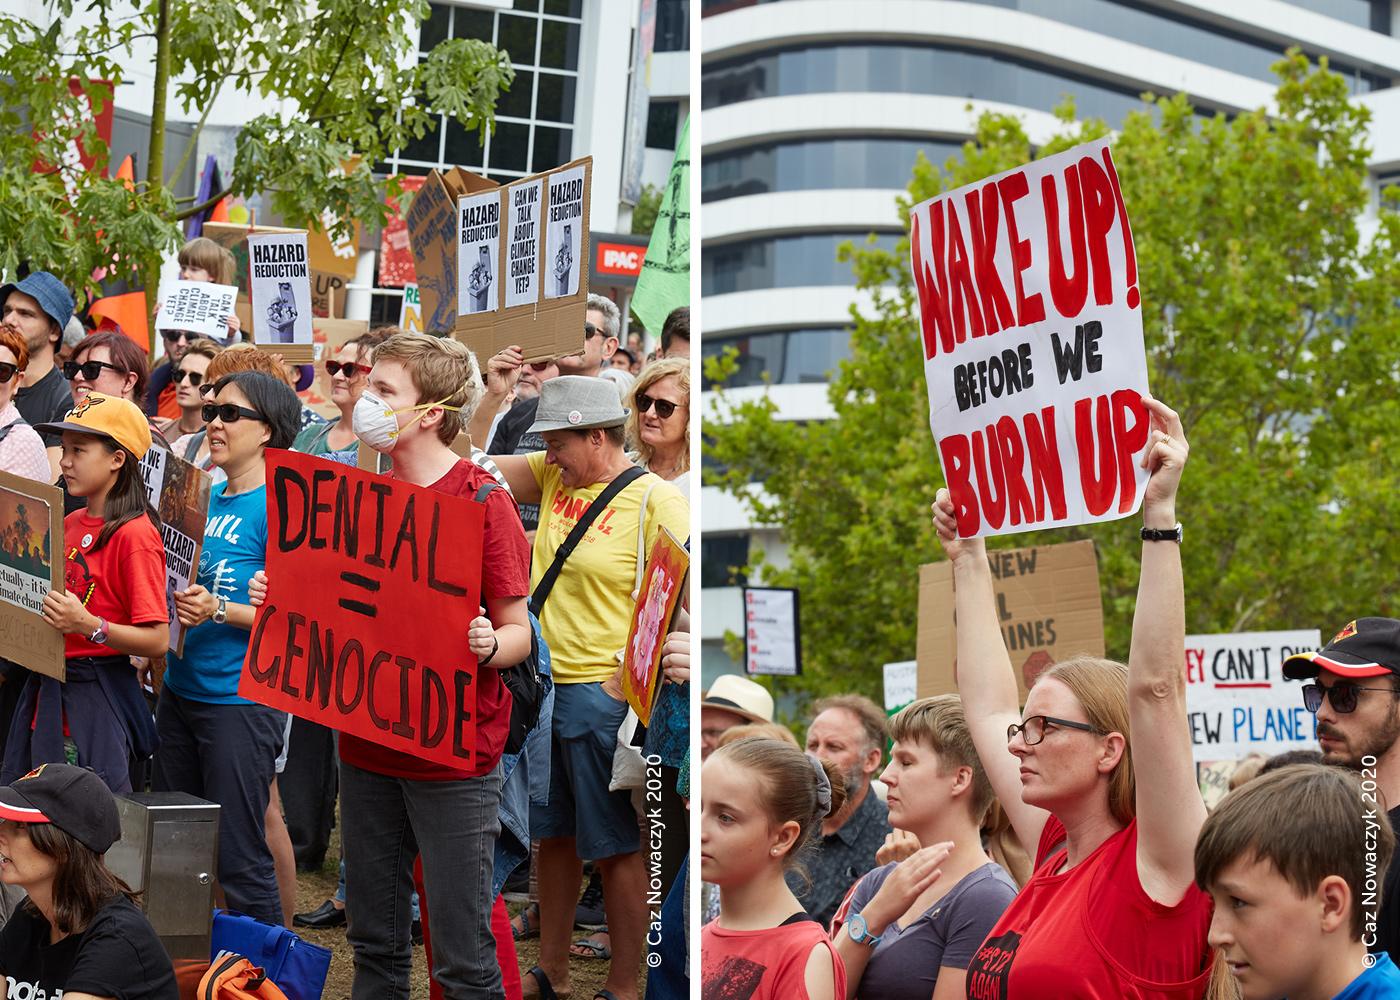 Climate-Change-Rally-Wollongong-January-2020-by-Caz-Nowaczyk-04